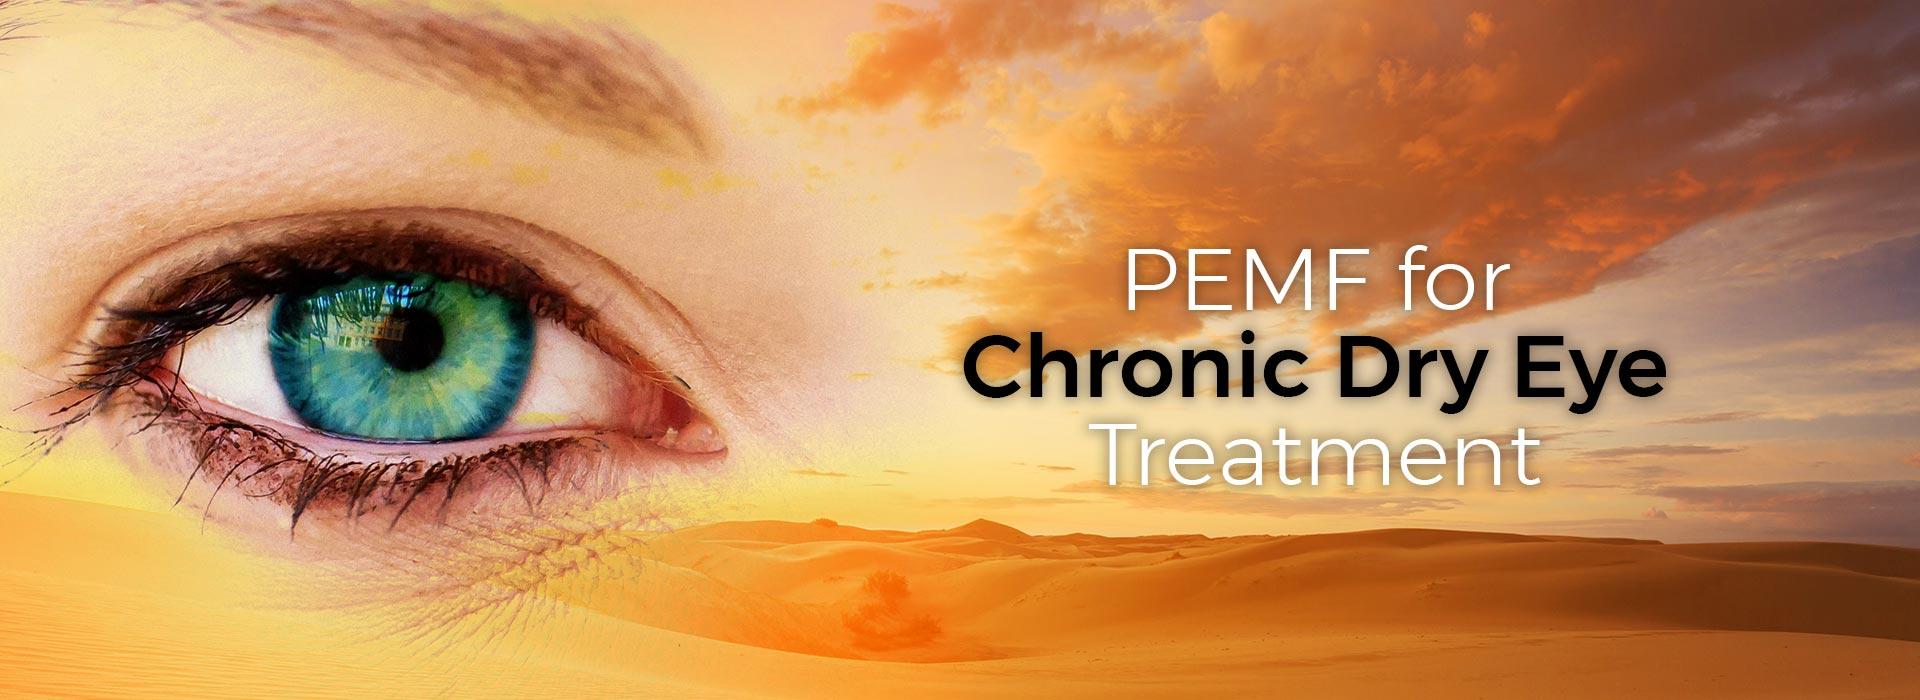 PEMF for Chronic Dry Eye Treatment